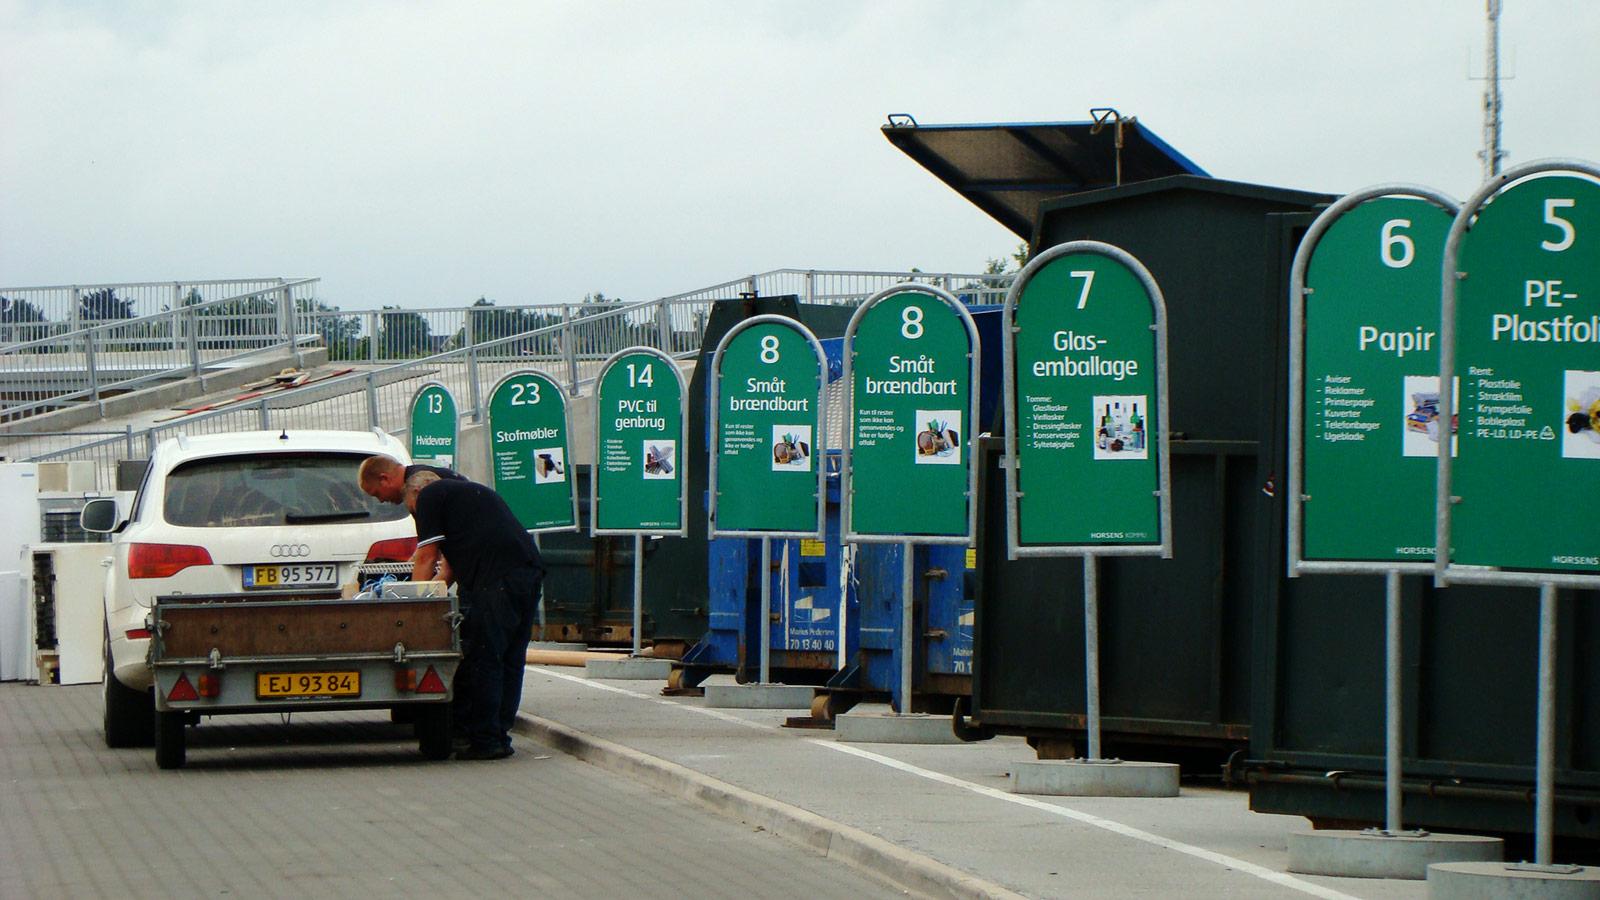 Genbrugsplads in Denmark